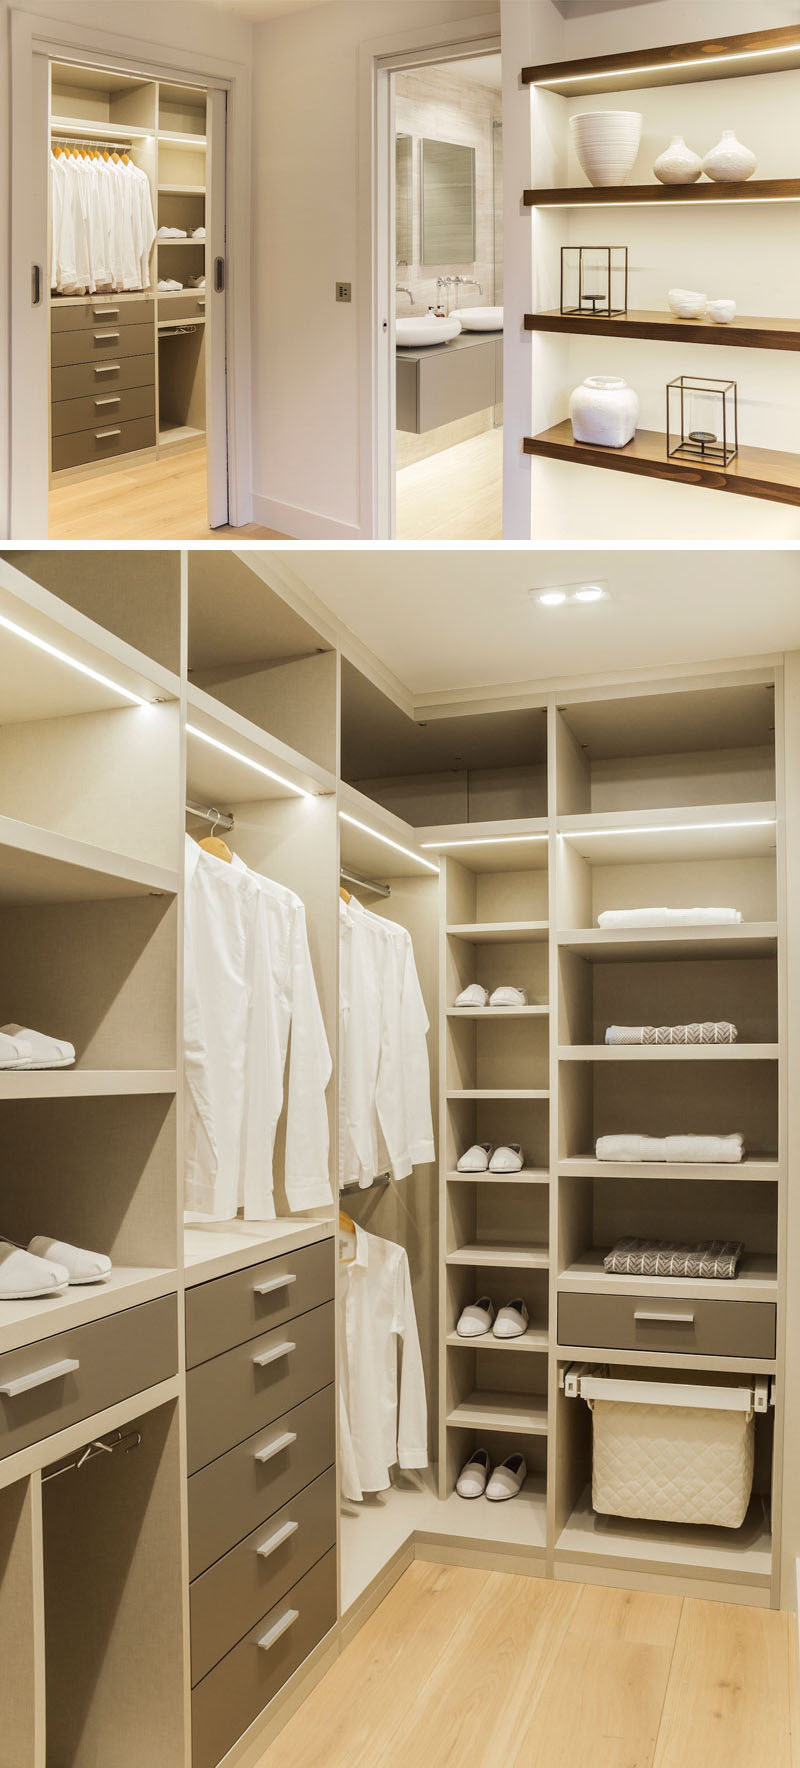 This modern walk-in closet features plenty of floor-to-ceiling storage and bright lighting. #WalkInCloset #Closet #InteriorDesign